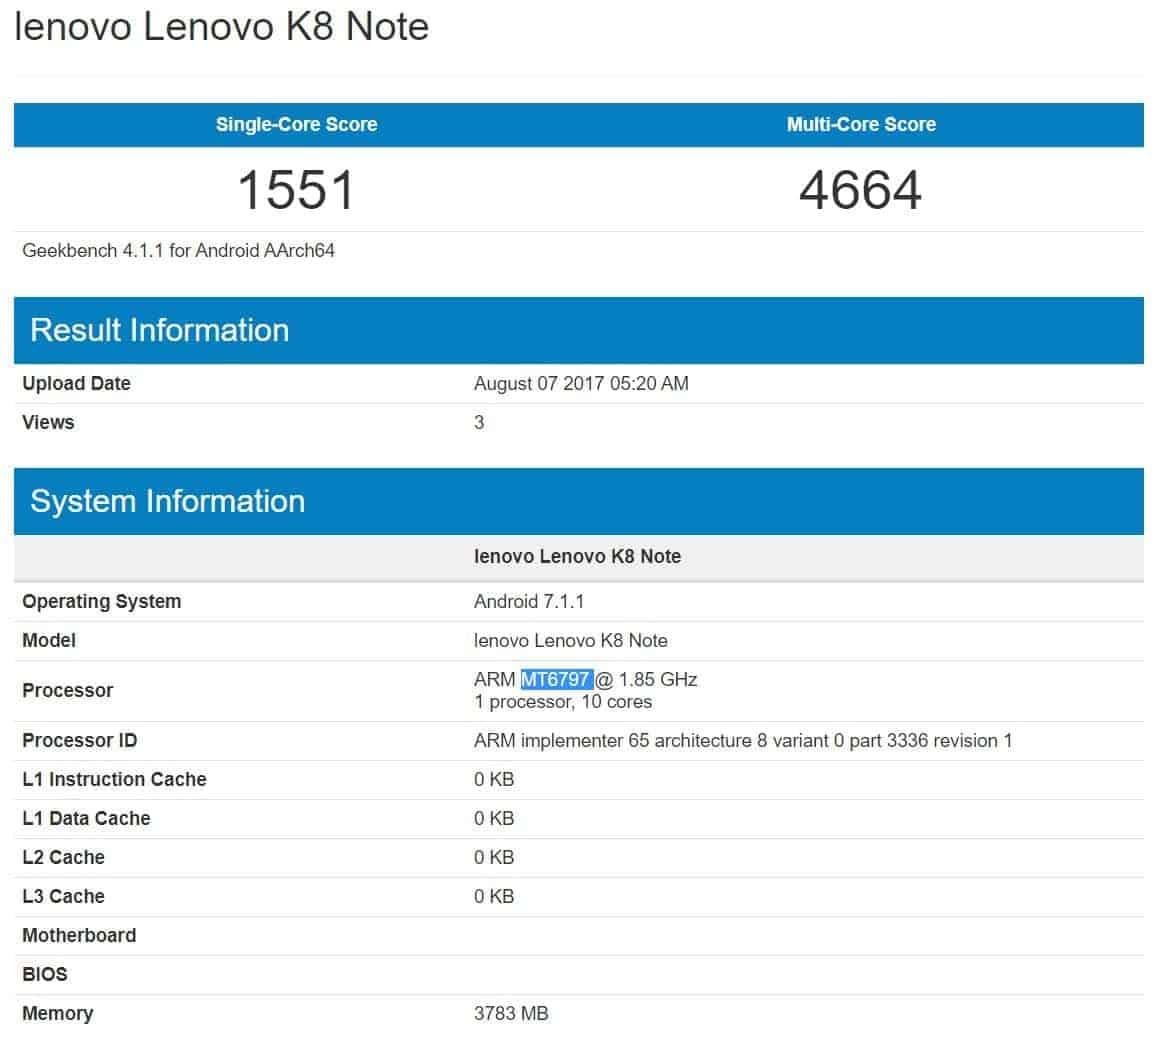 Lenovo K8 Note Geekbench